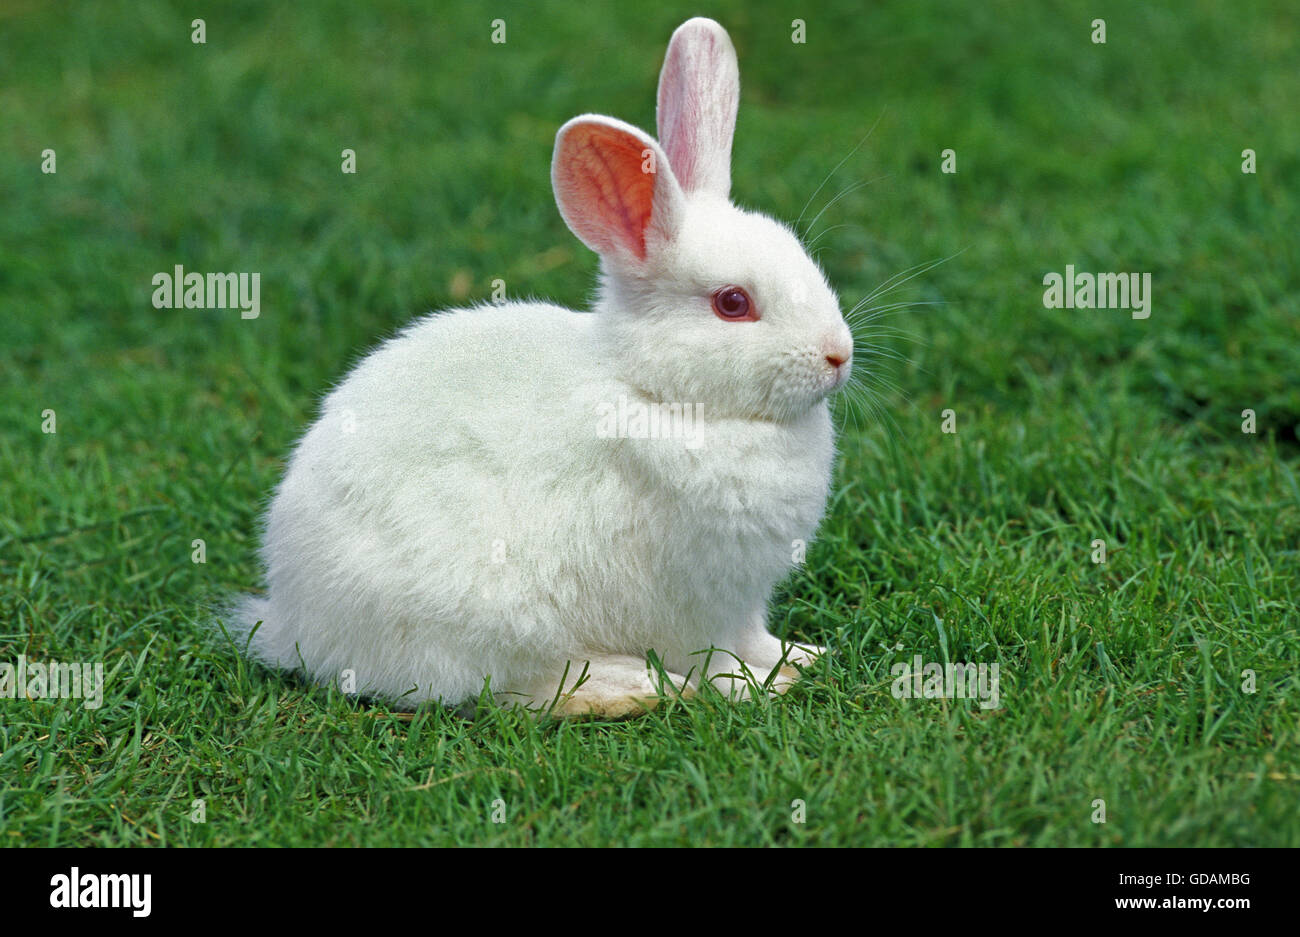 Lapin Dwarft albinos sur l'herbe Photo Stock